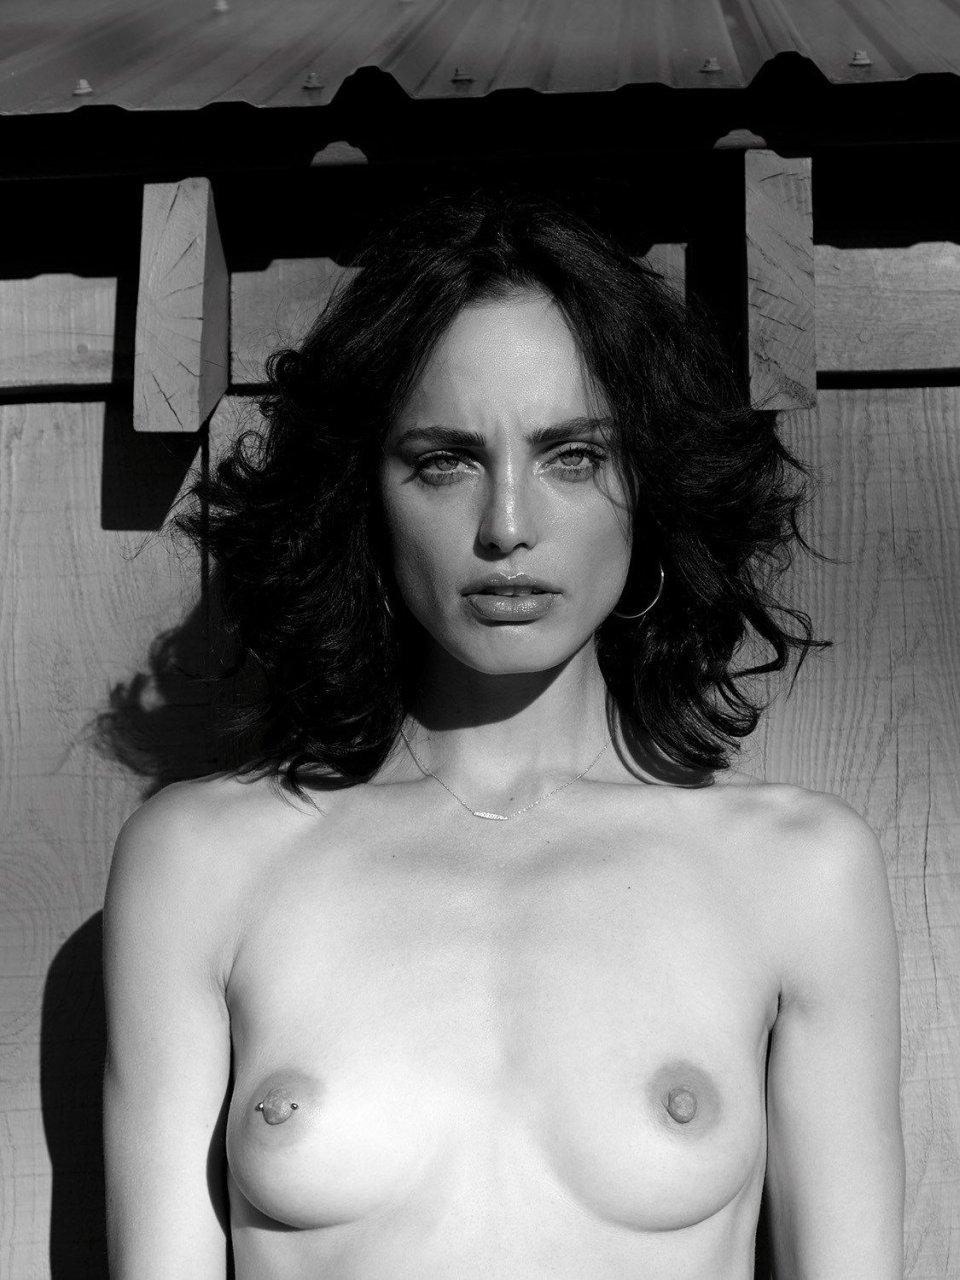 nude (26 photo), Tits Celebrity image